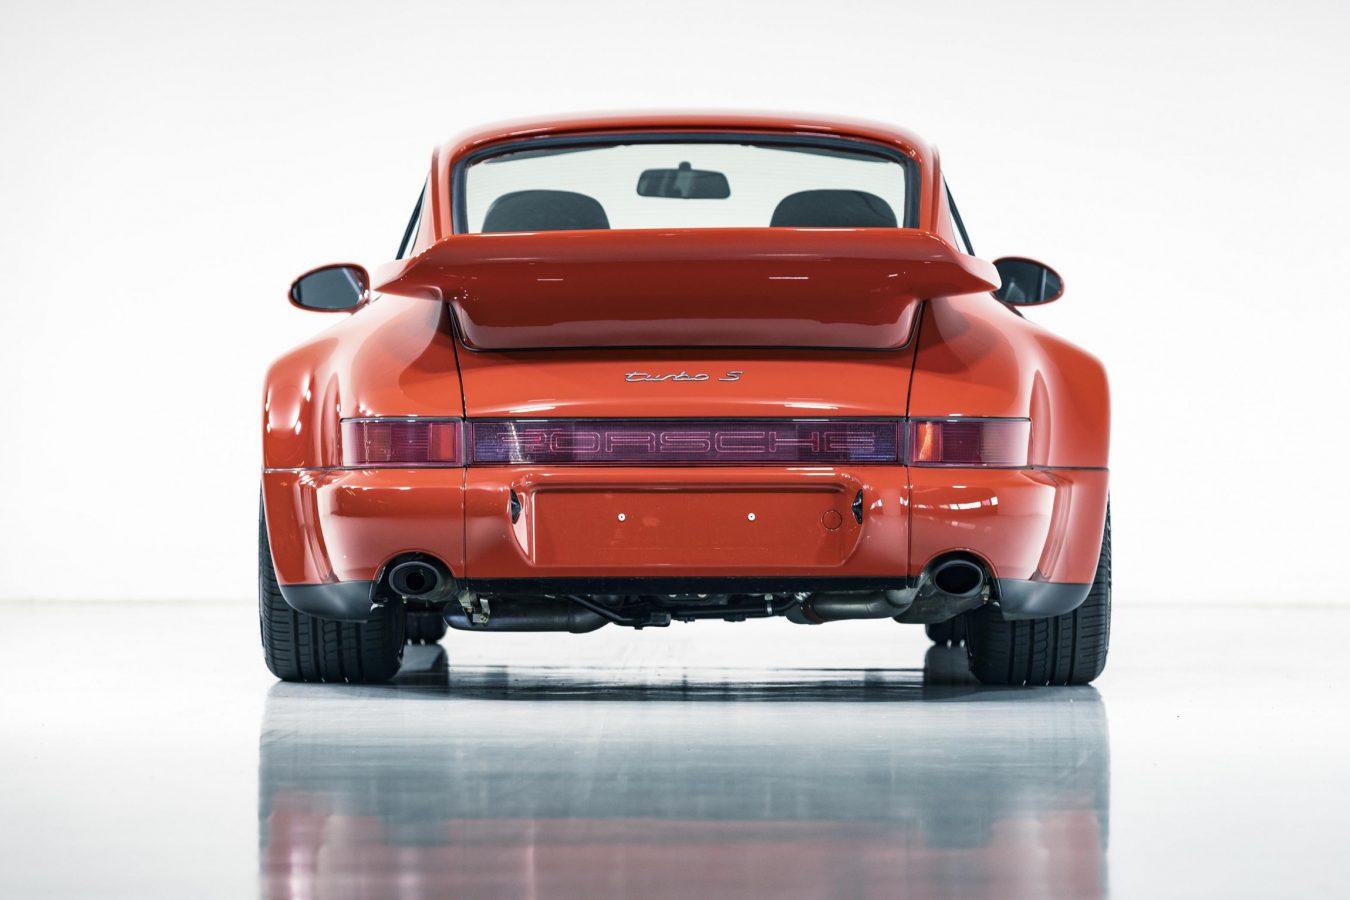 Porsche 911 Turbo S 6